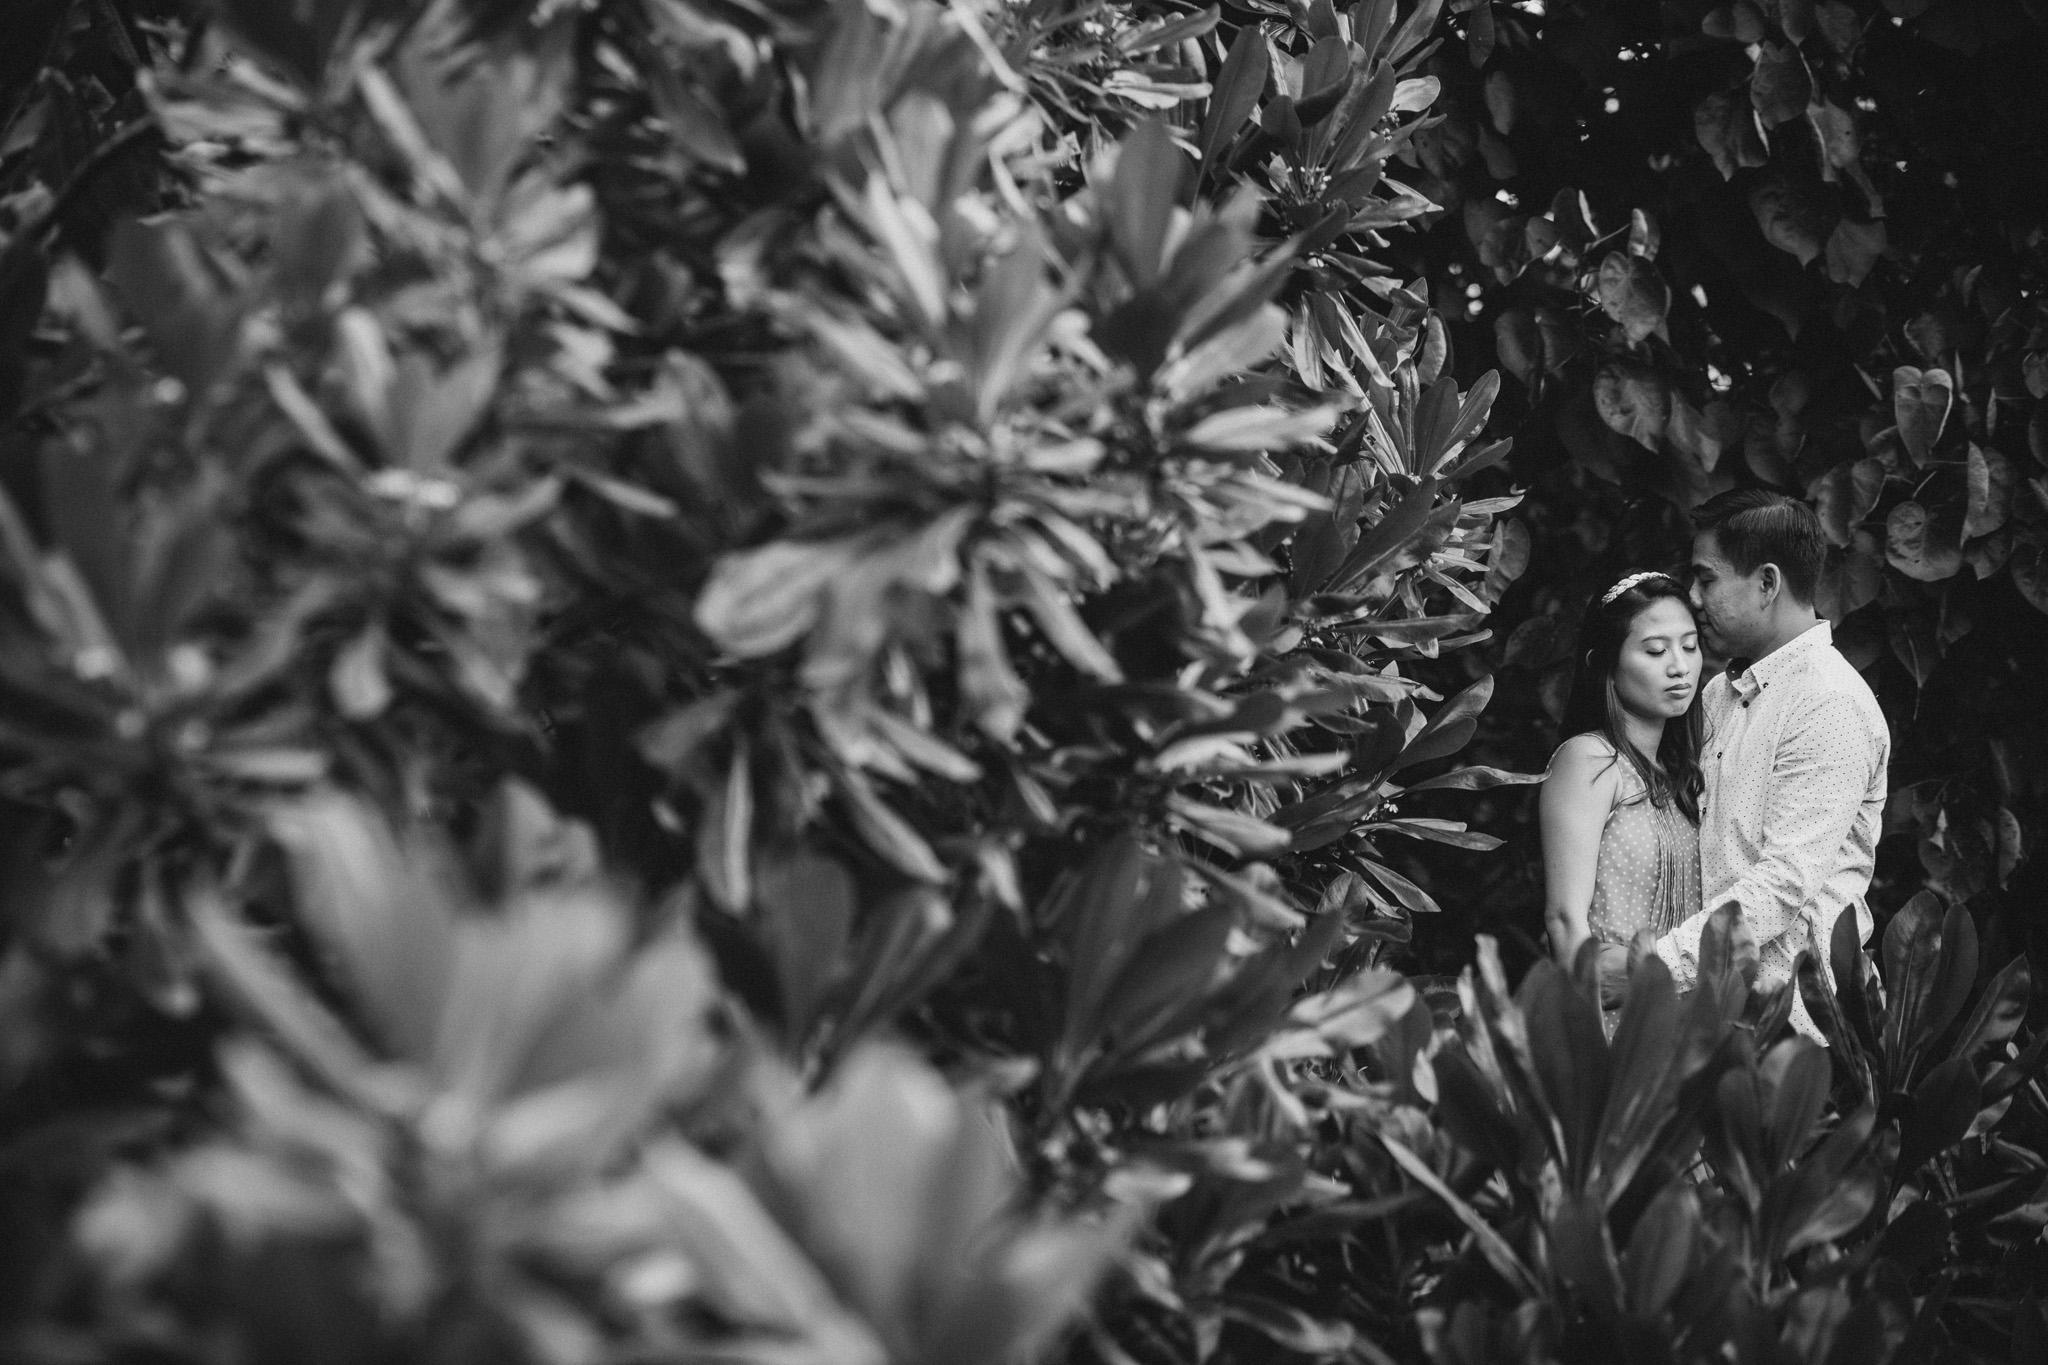 singapore--wedding-photographer-commercial-editorial-travel-wemadethese-firdaus-sasha-sessions-12.jpg